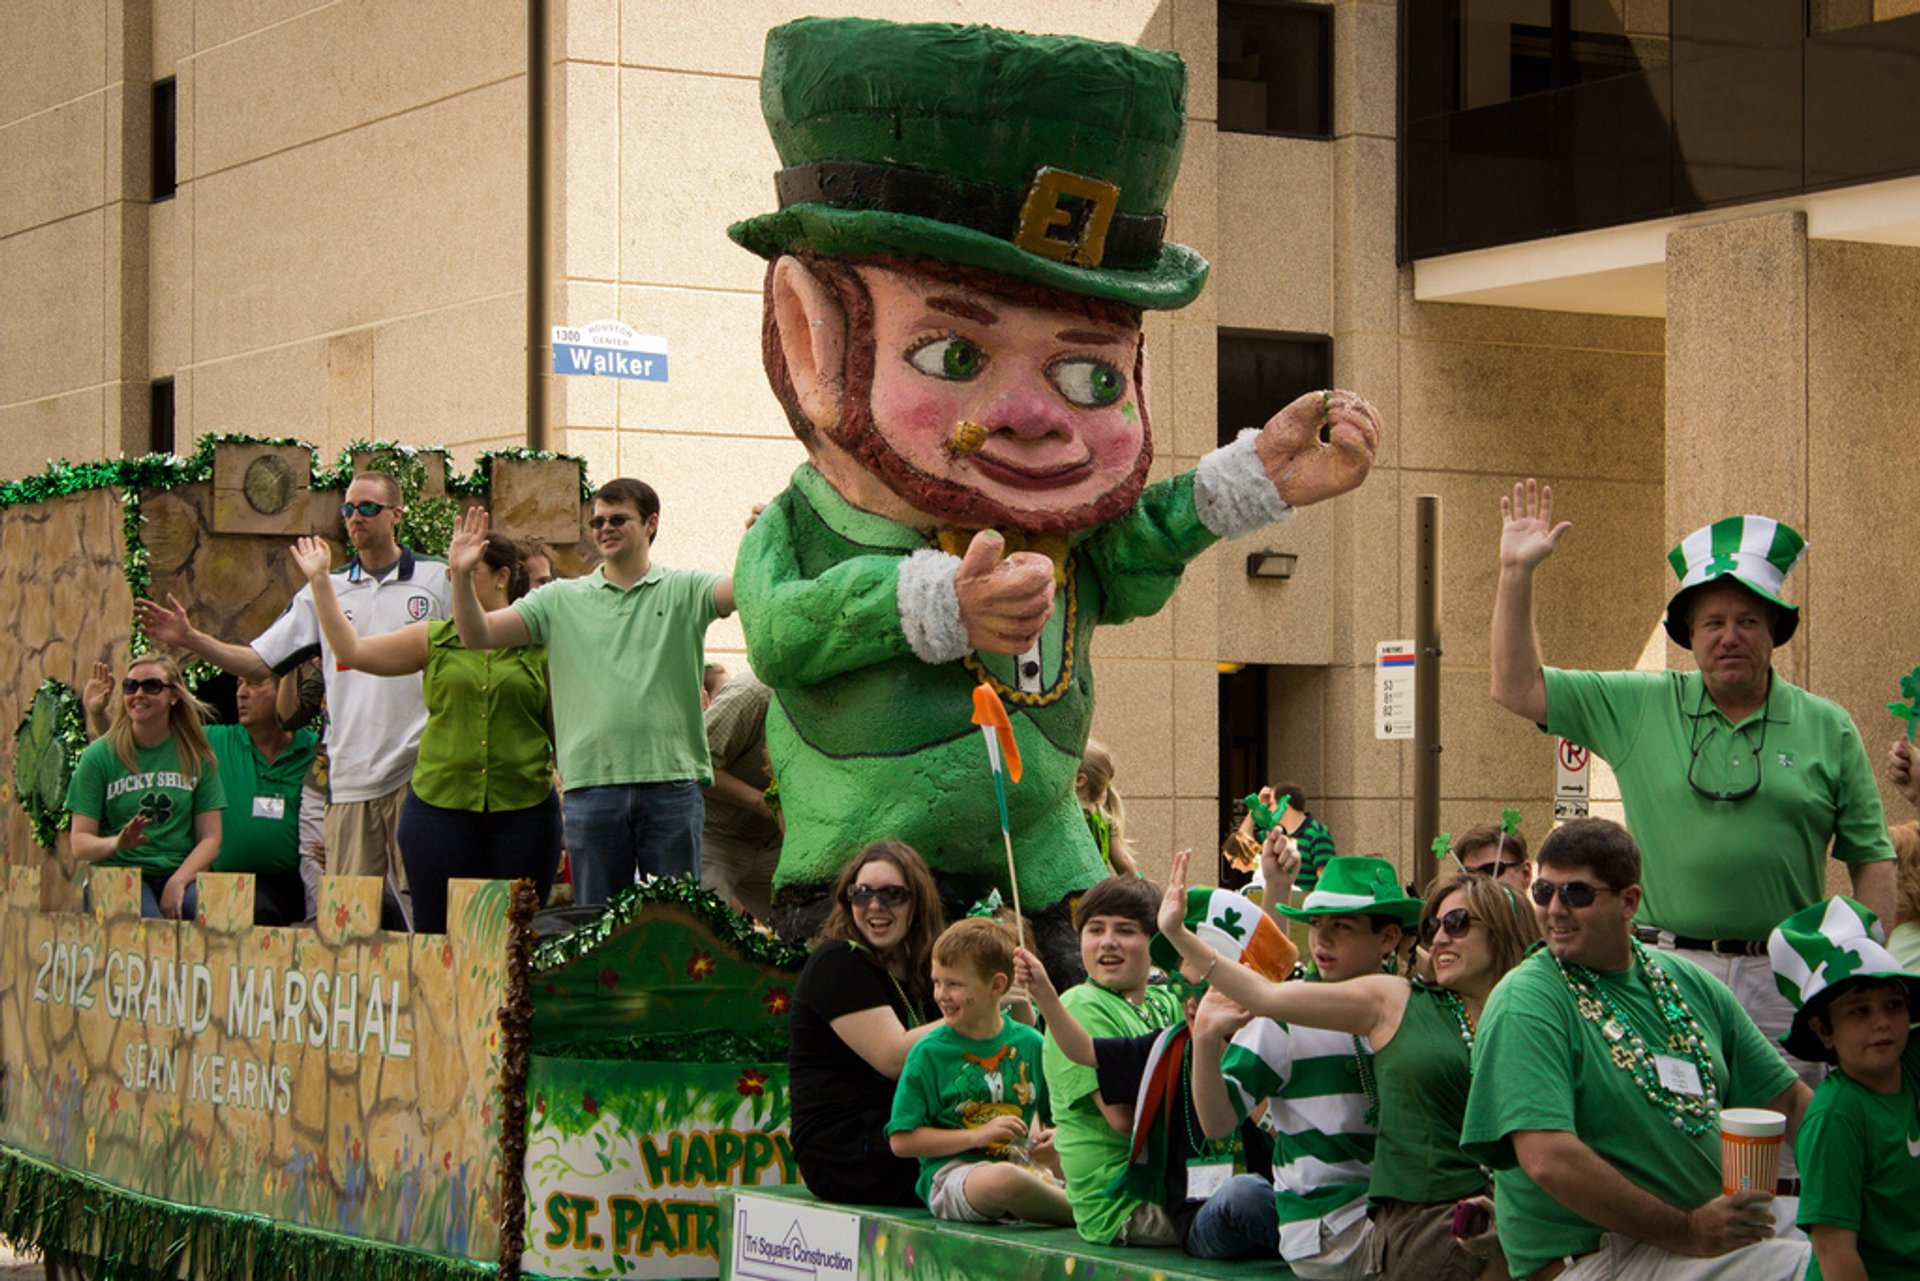 St Patricks Day parade, Downtown Houston